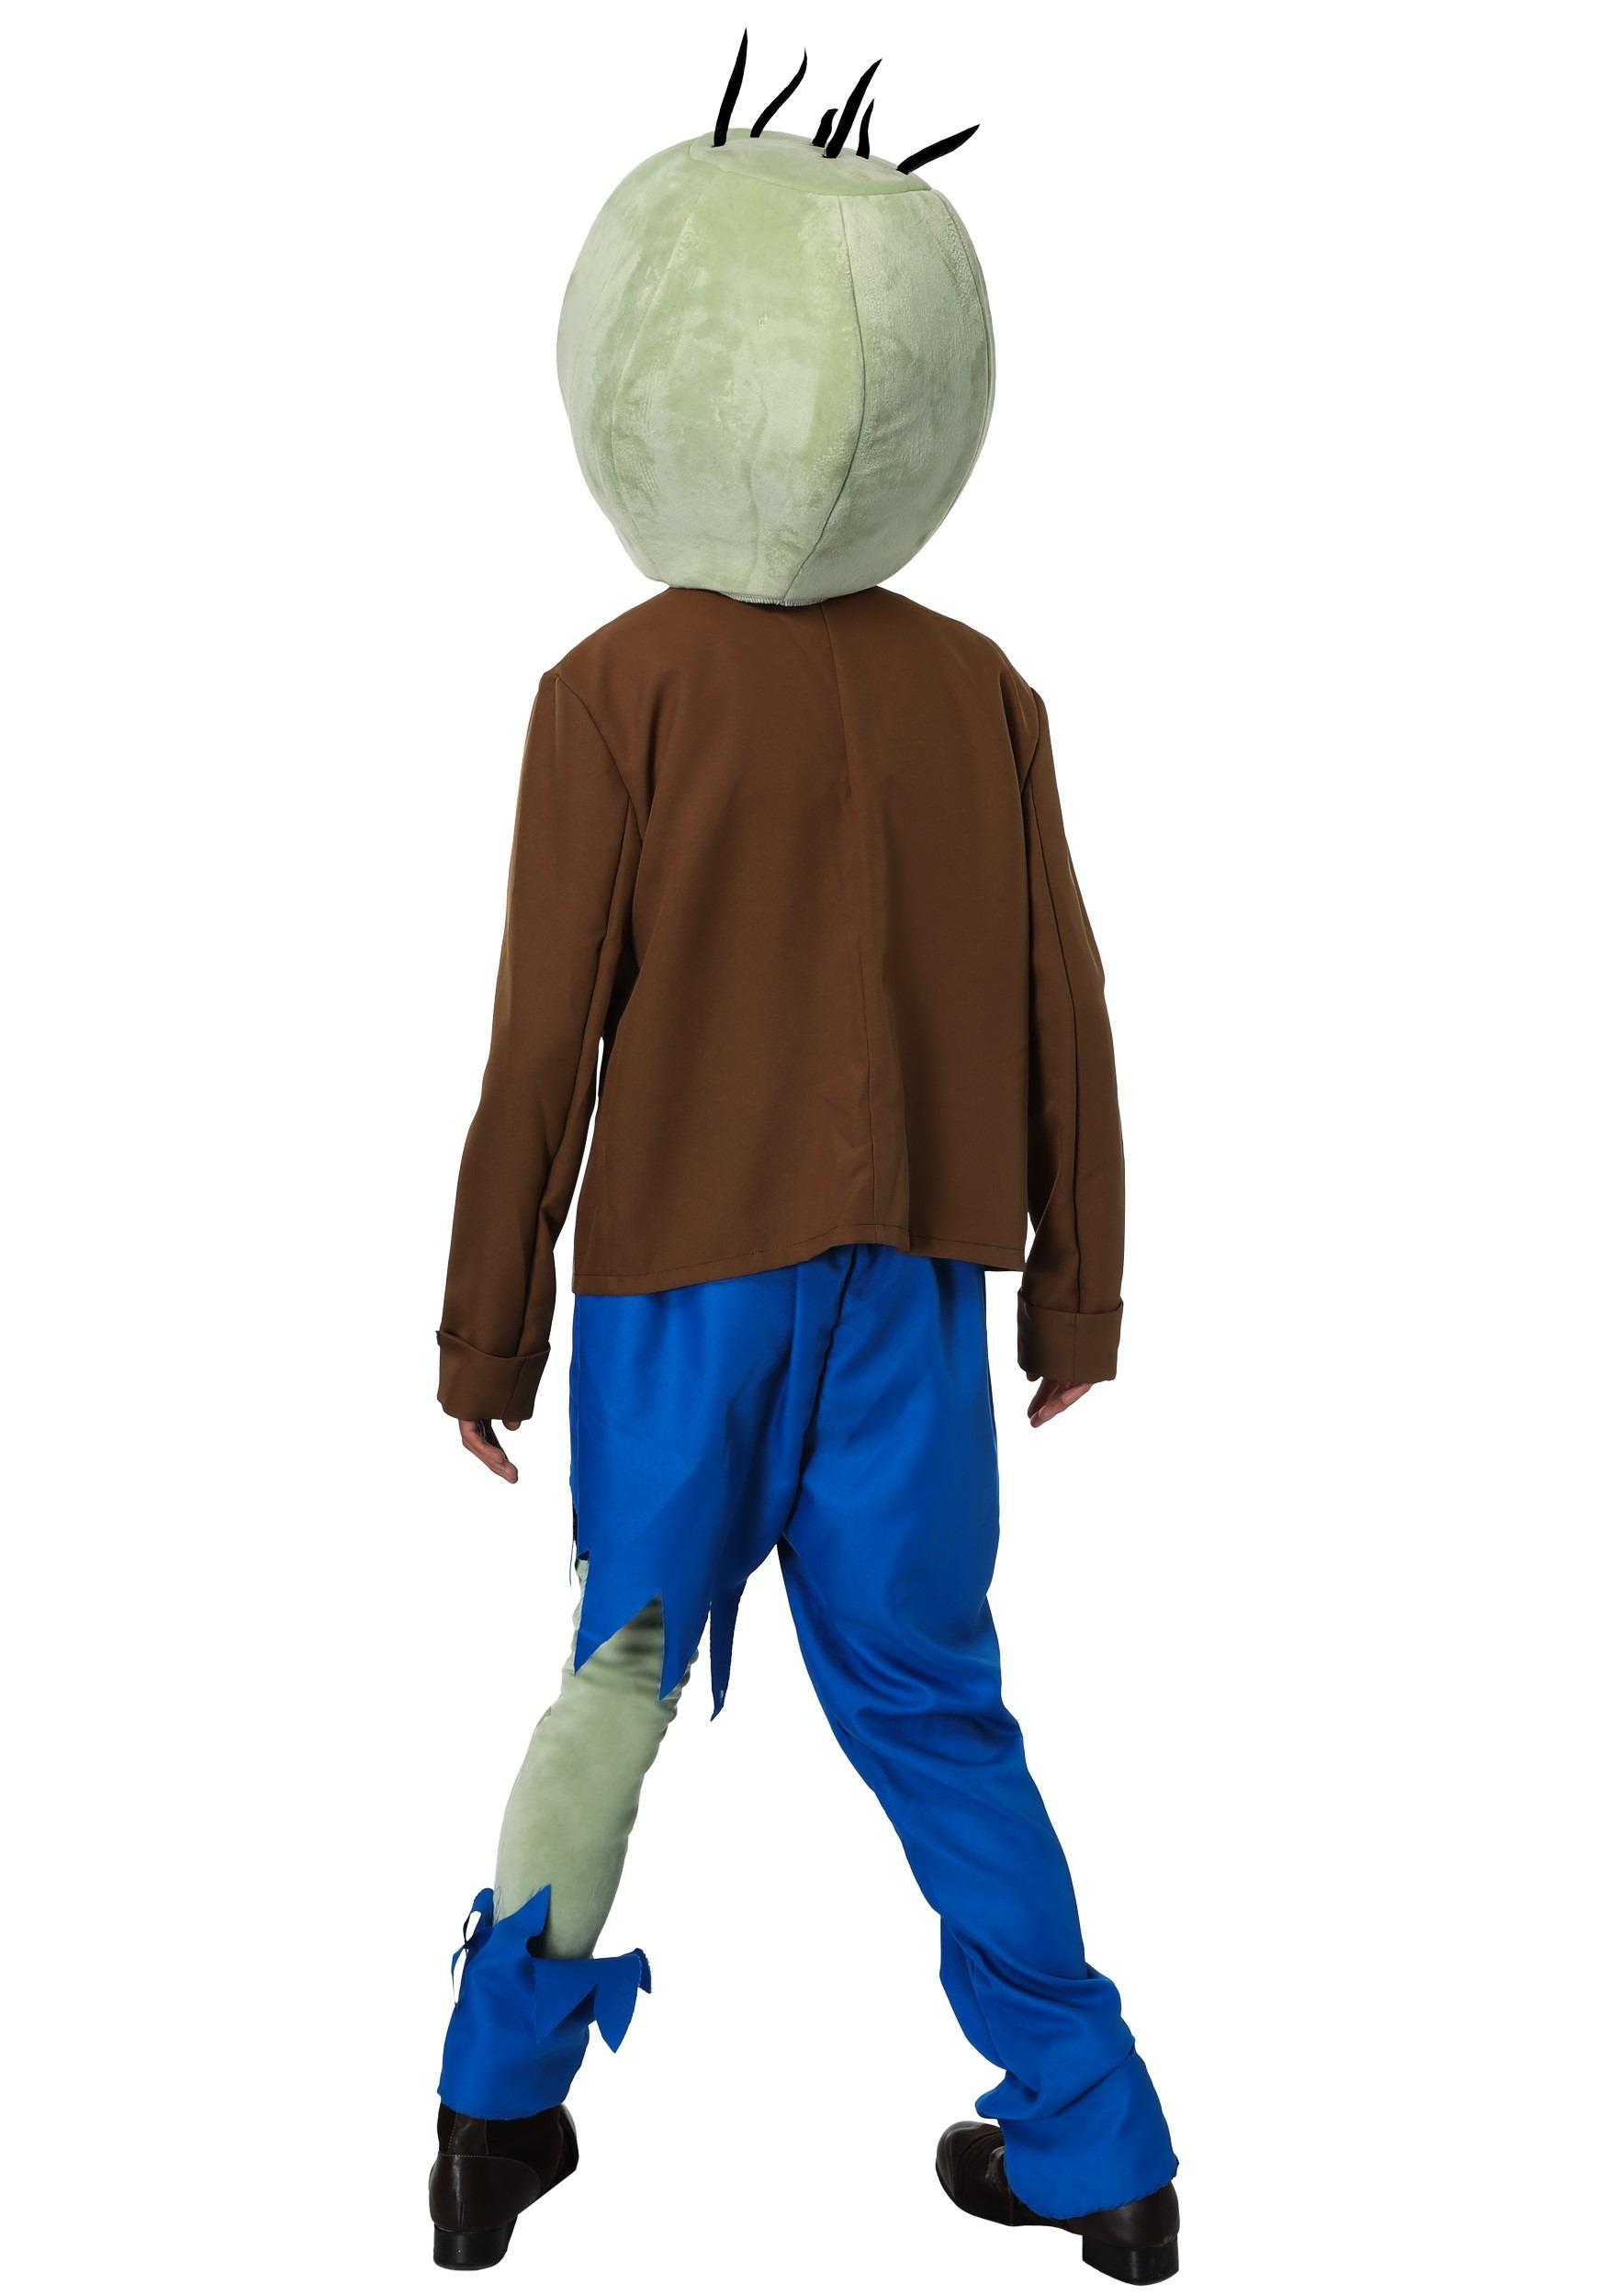 Kids PLANTS VS ZOMBIES Zombie Costume